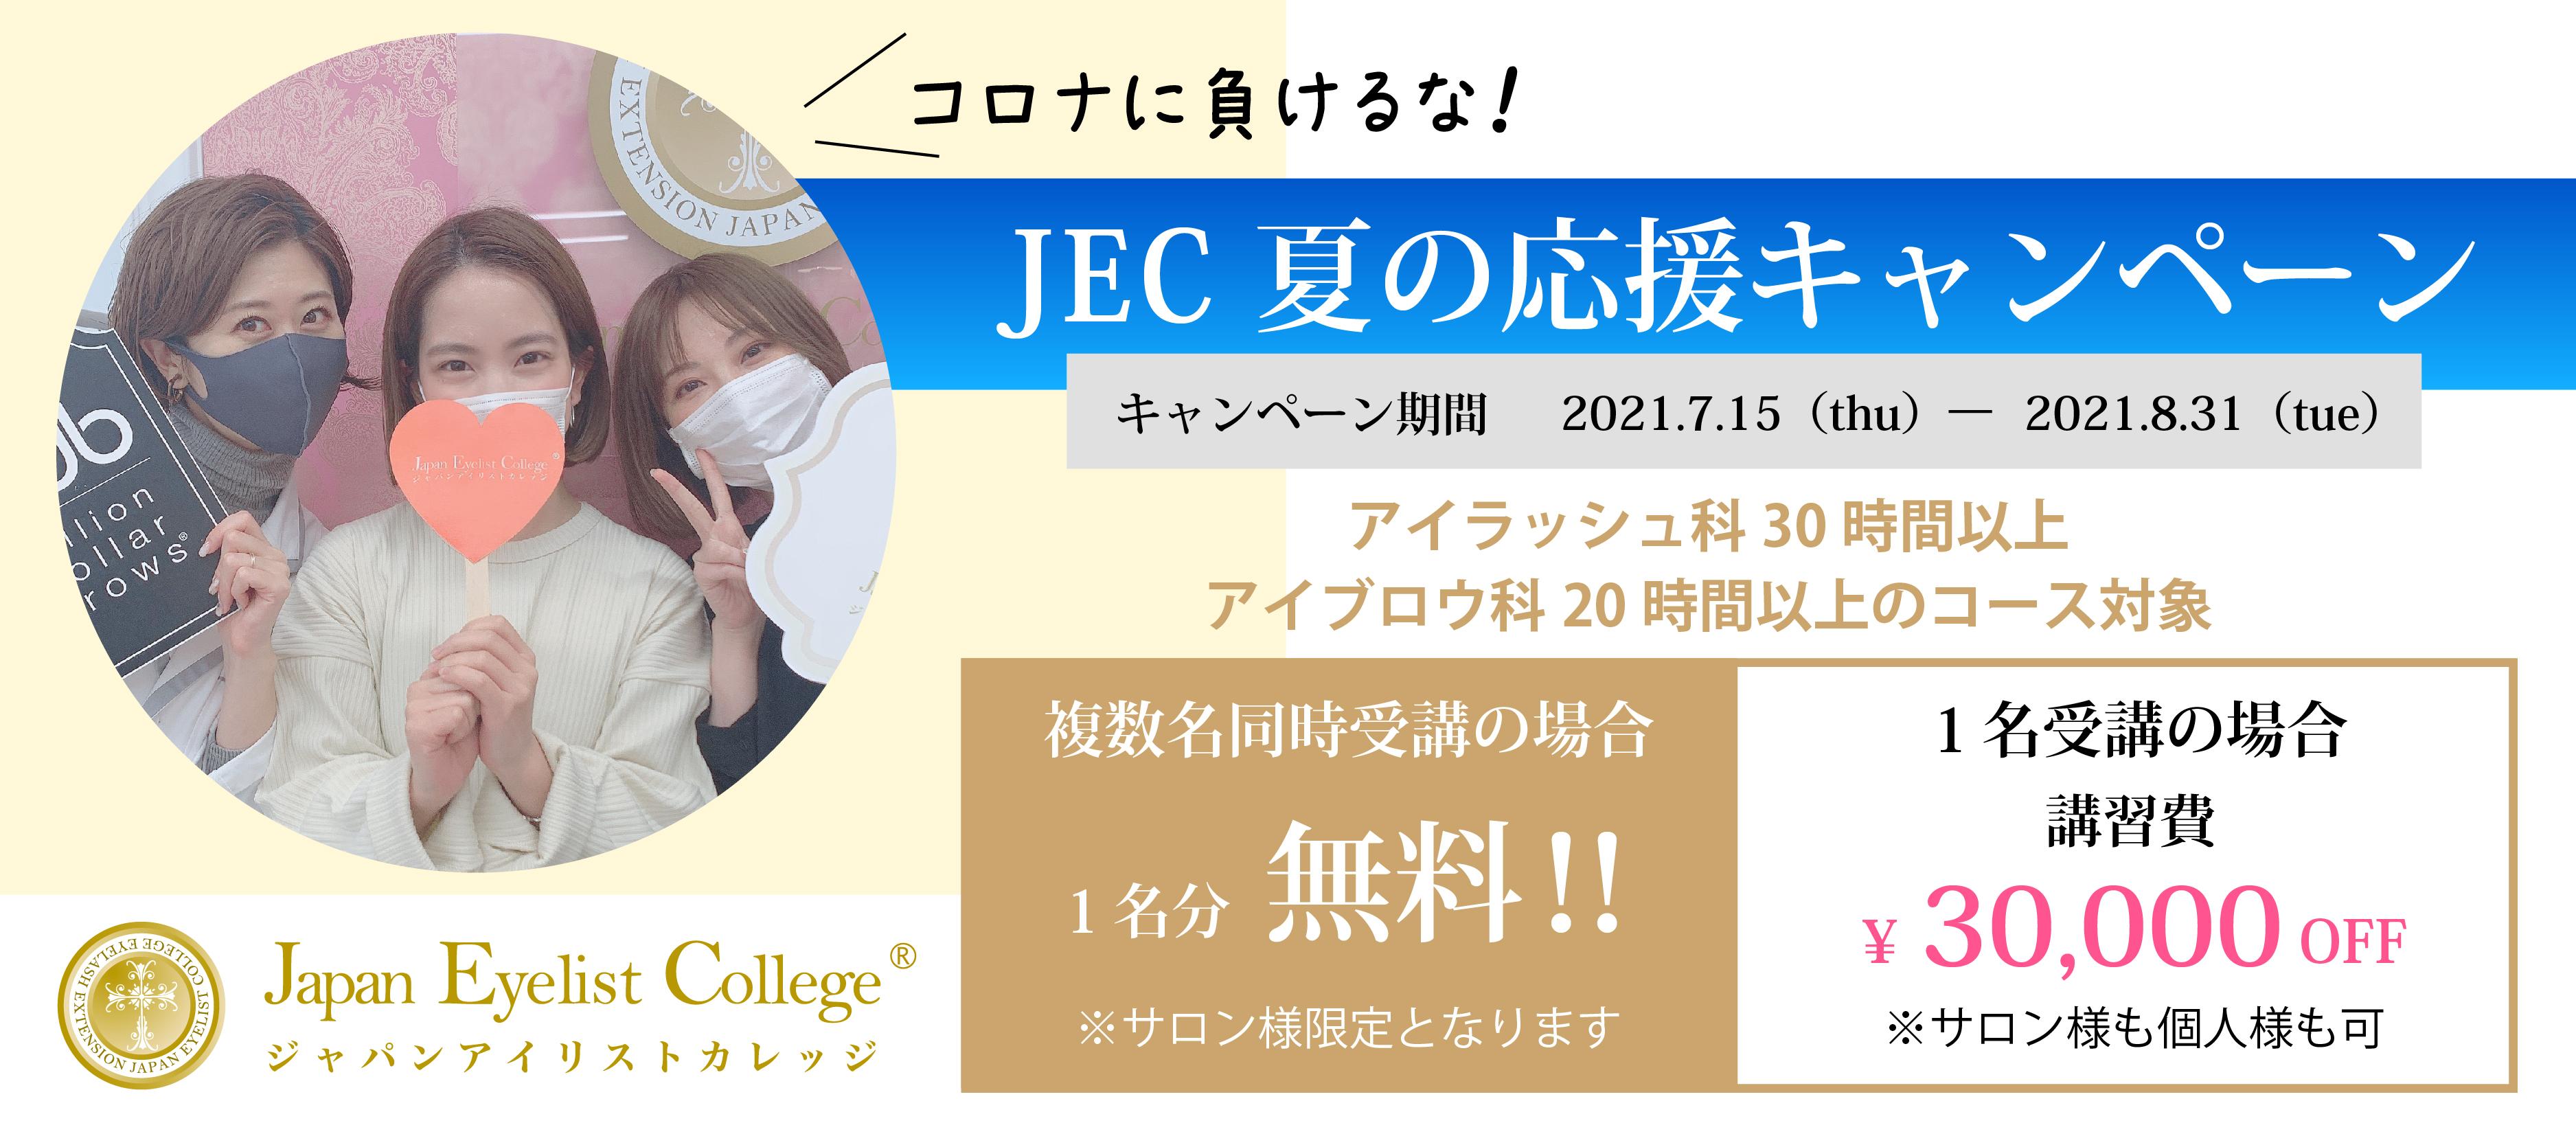 JEC 夏の応援キャンペーン